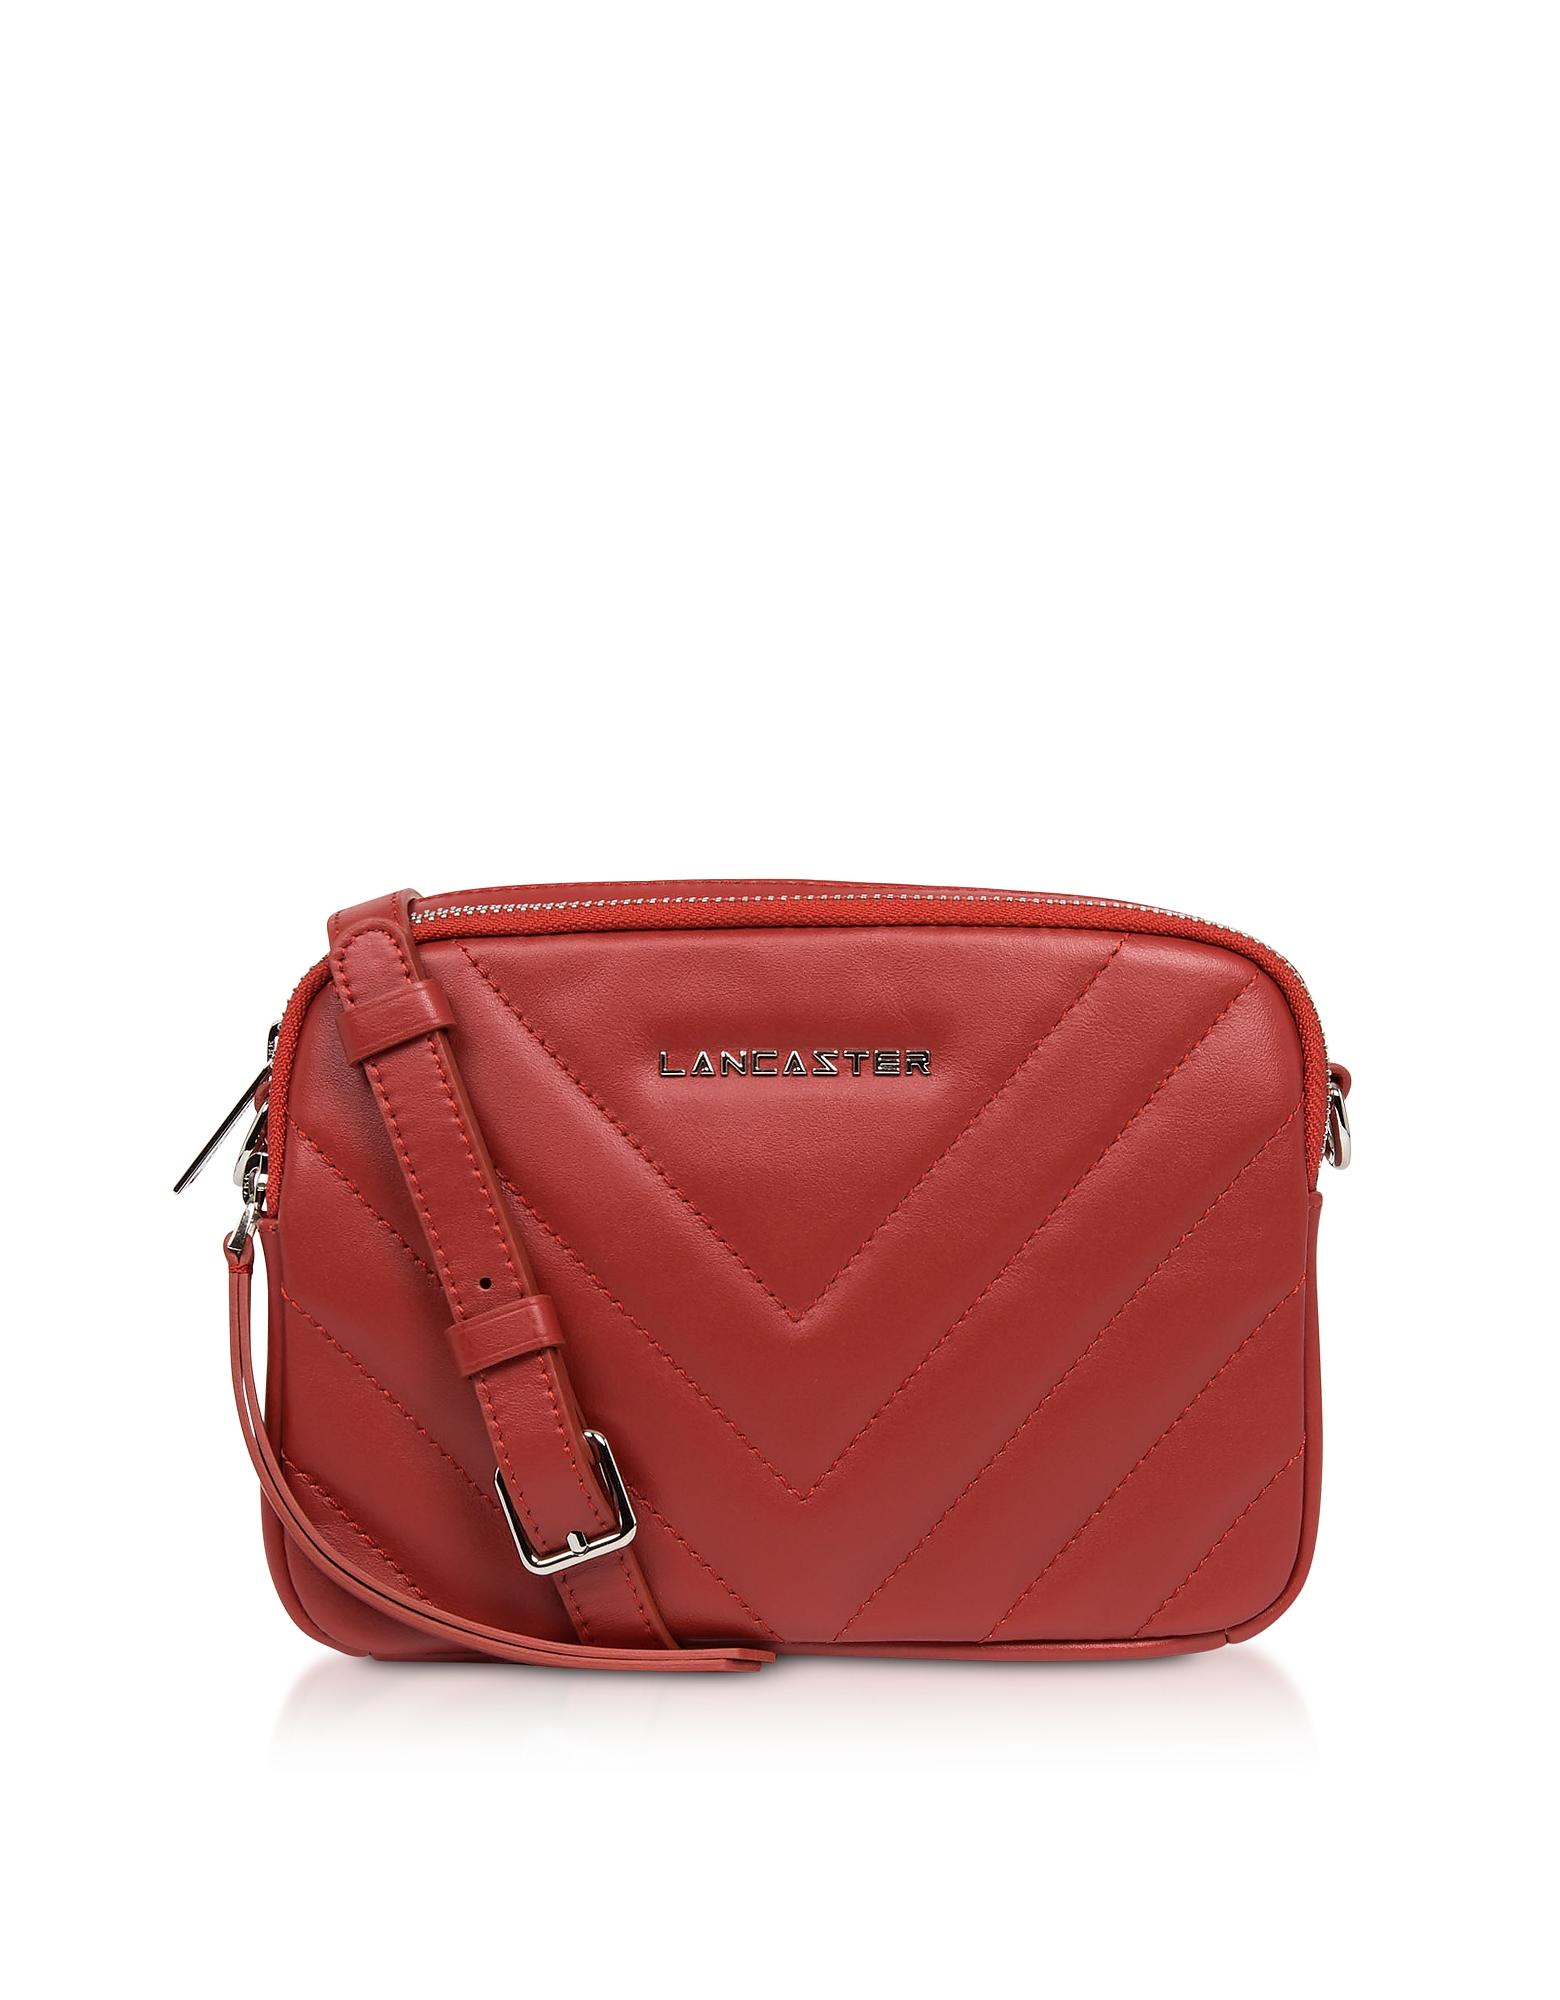 Lancaster Paris Handbags, Parisienne Couture Small Crossbody Bag